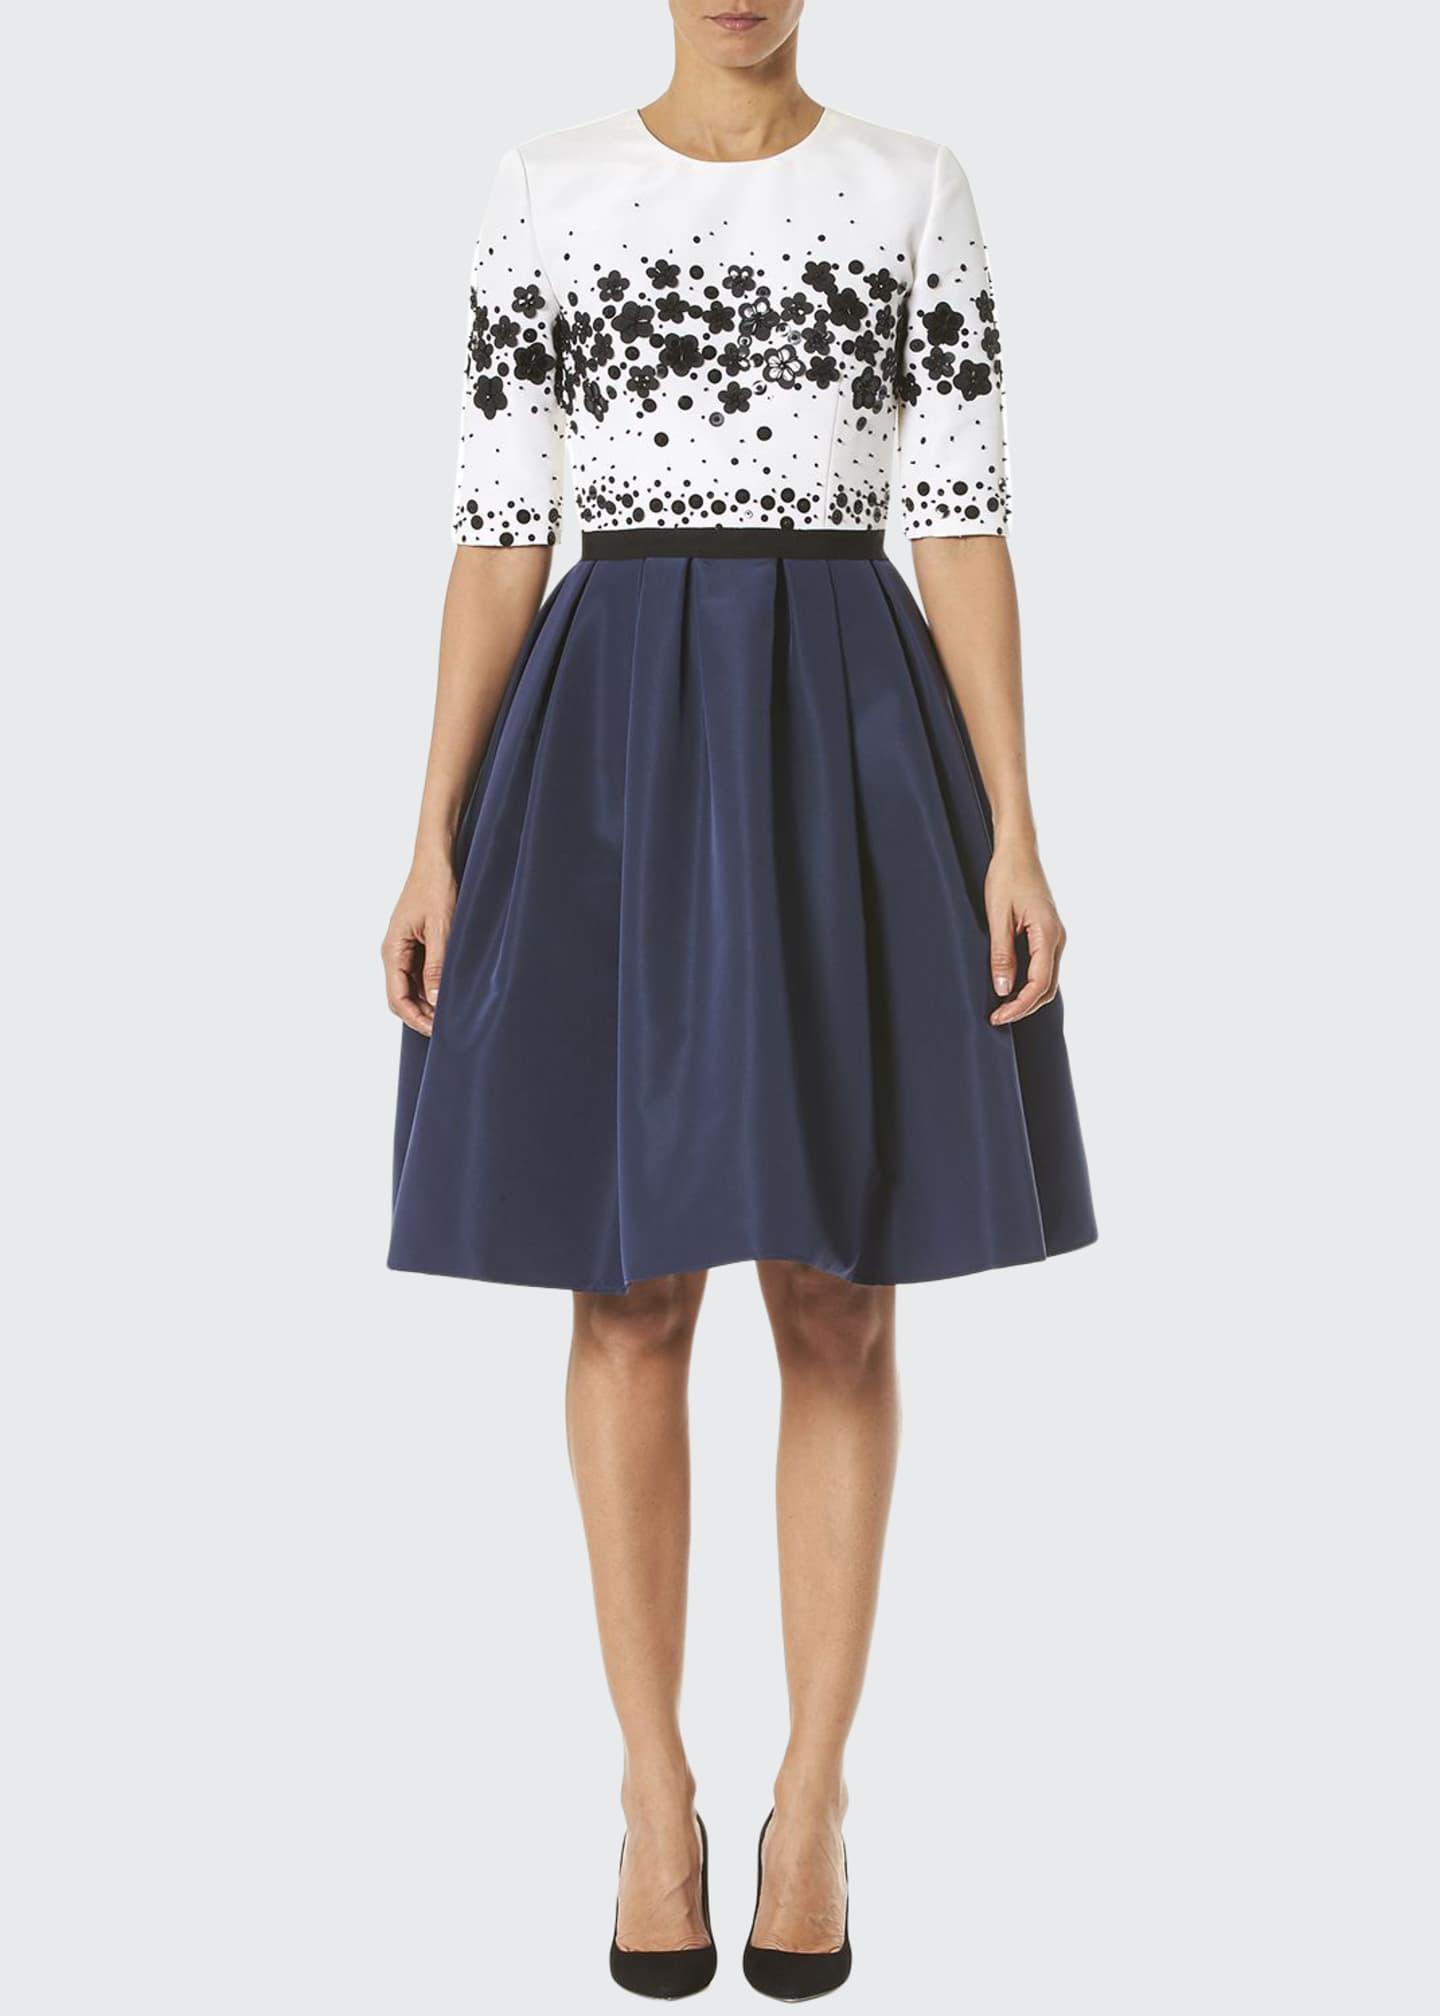 Carolina Herrera Half-Sleeve Fit-&-Flare Dress